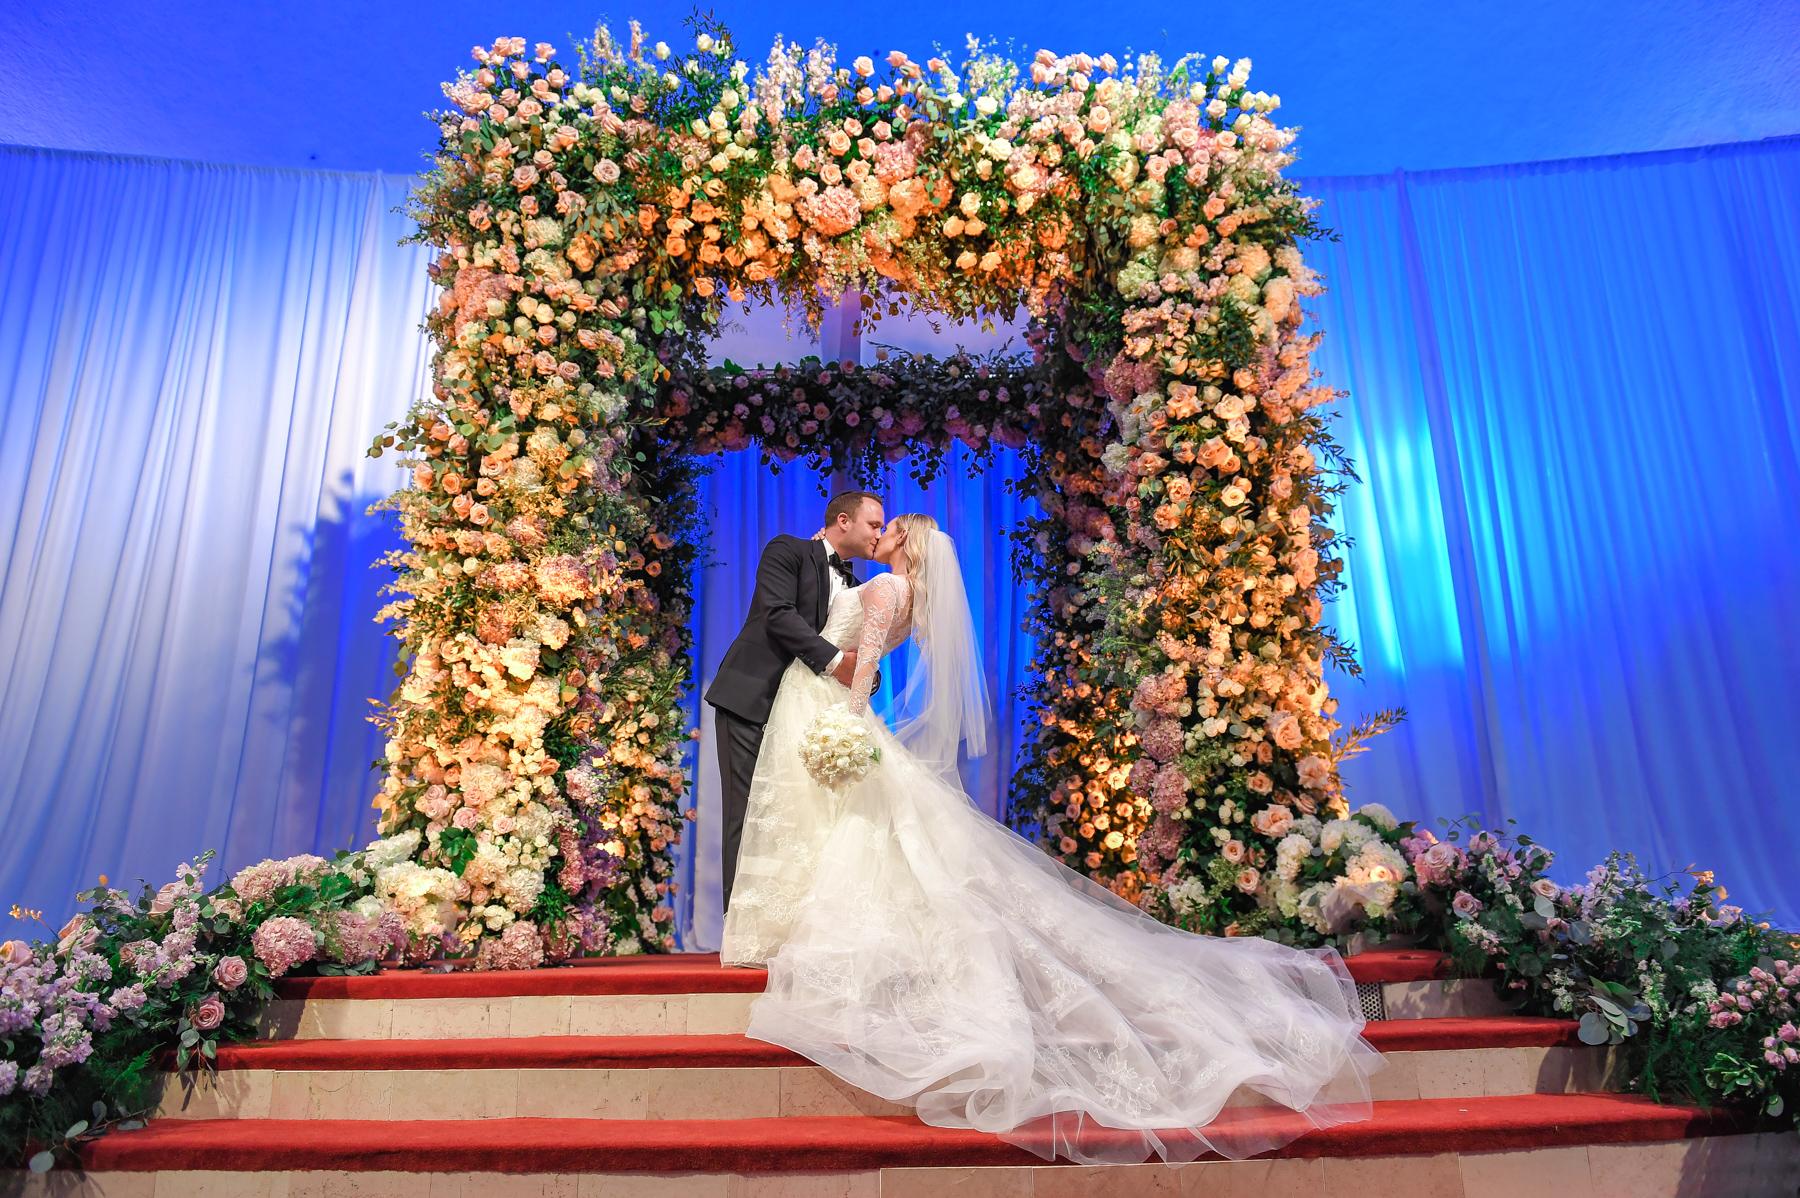 Bride and groom under a lavish chuppa at Aventura Turnberry Jewish Center & Tauber Academy